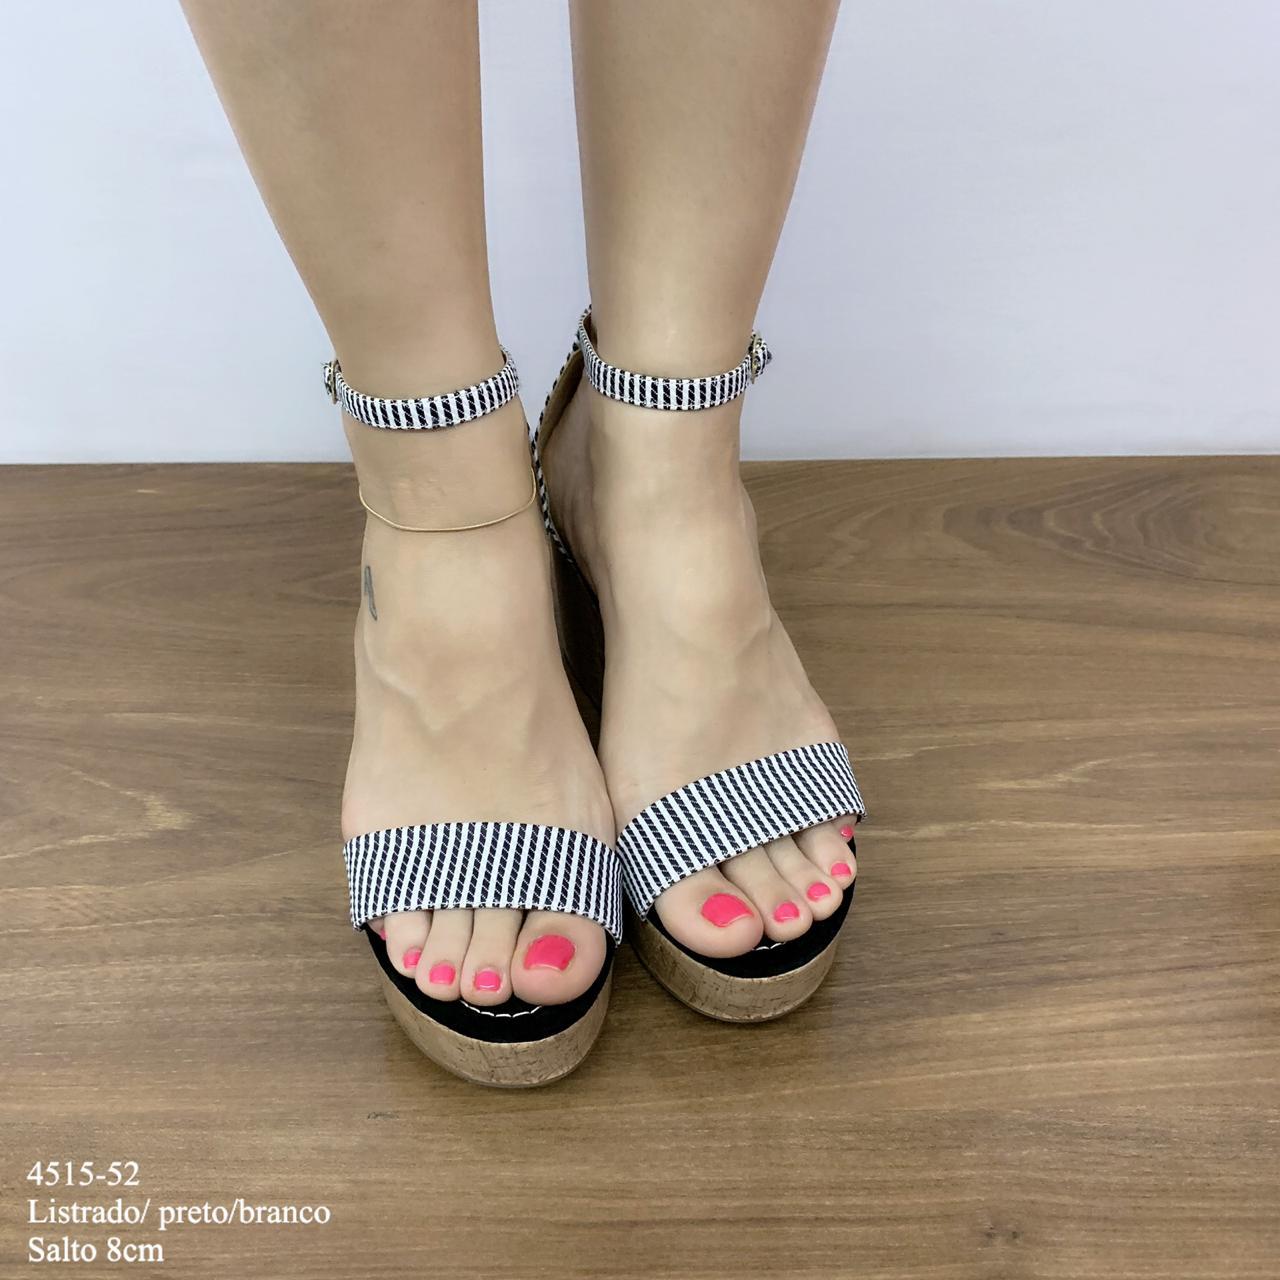 Sandália Preto E Branco Listrado | D-4515-52